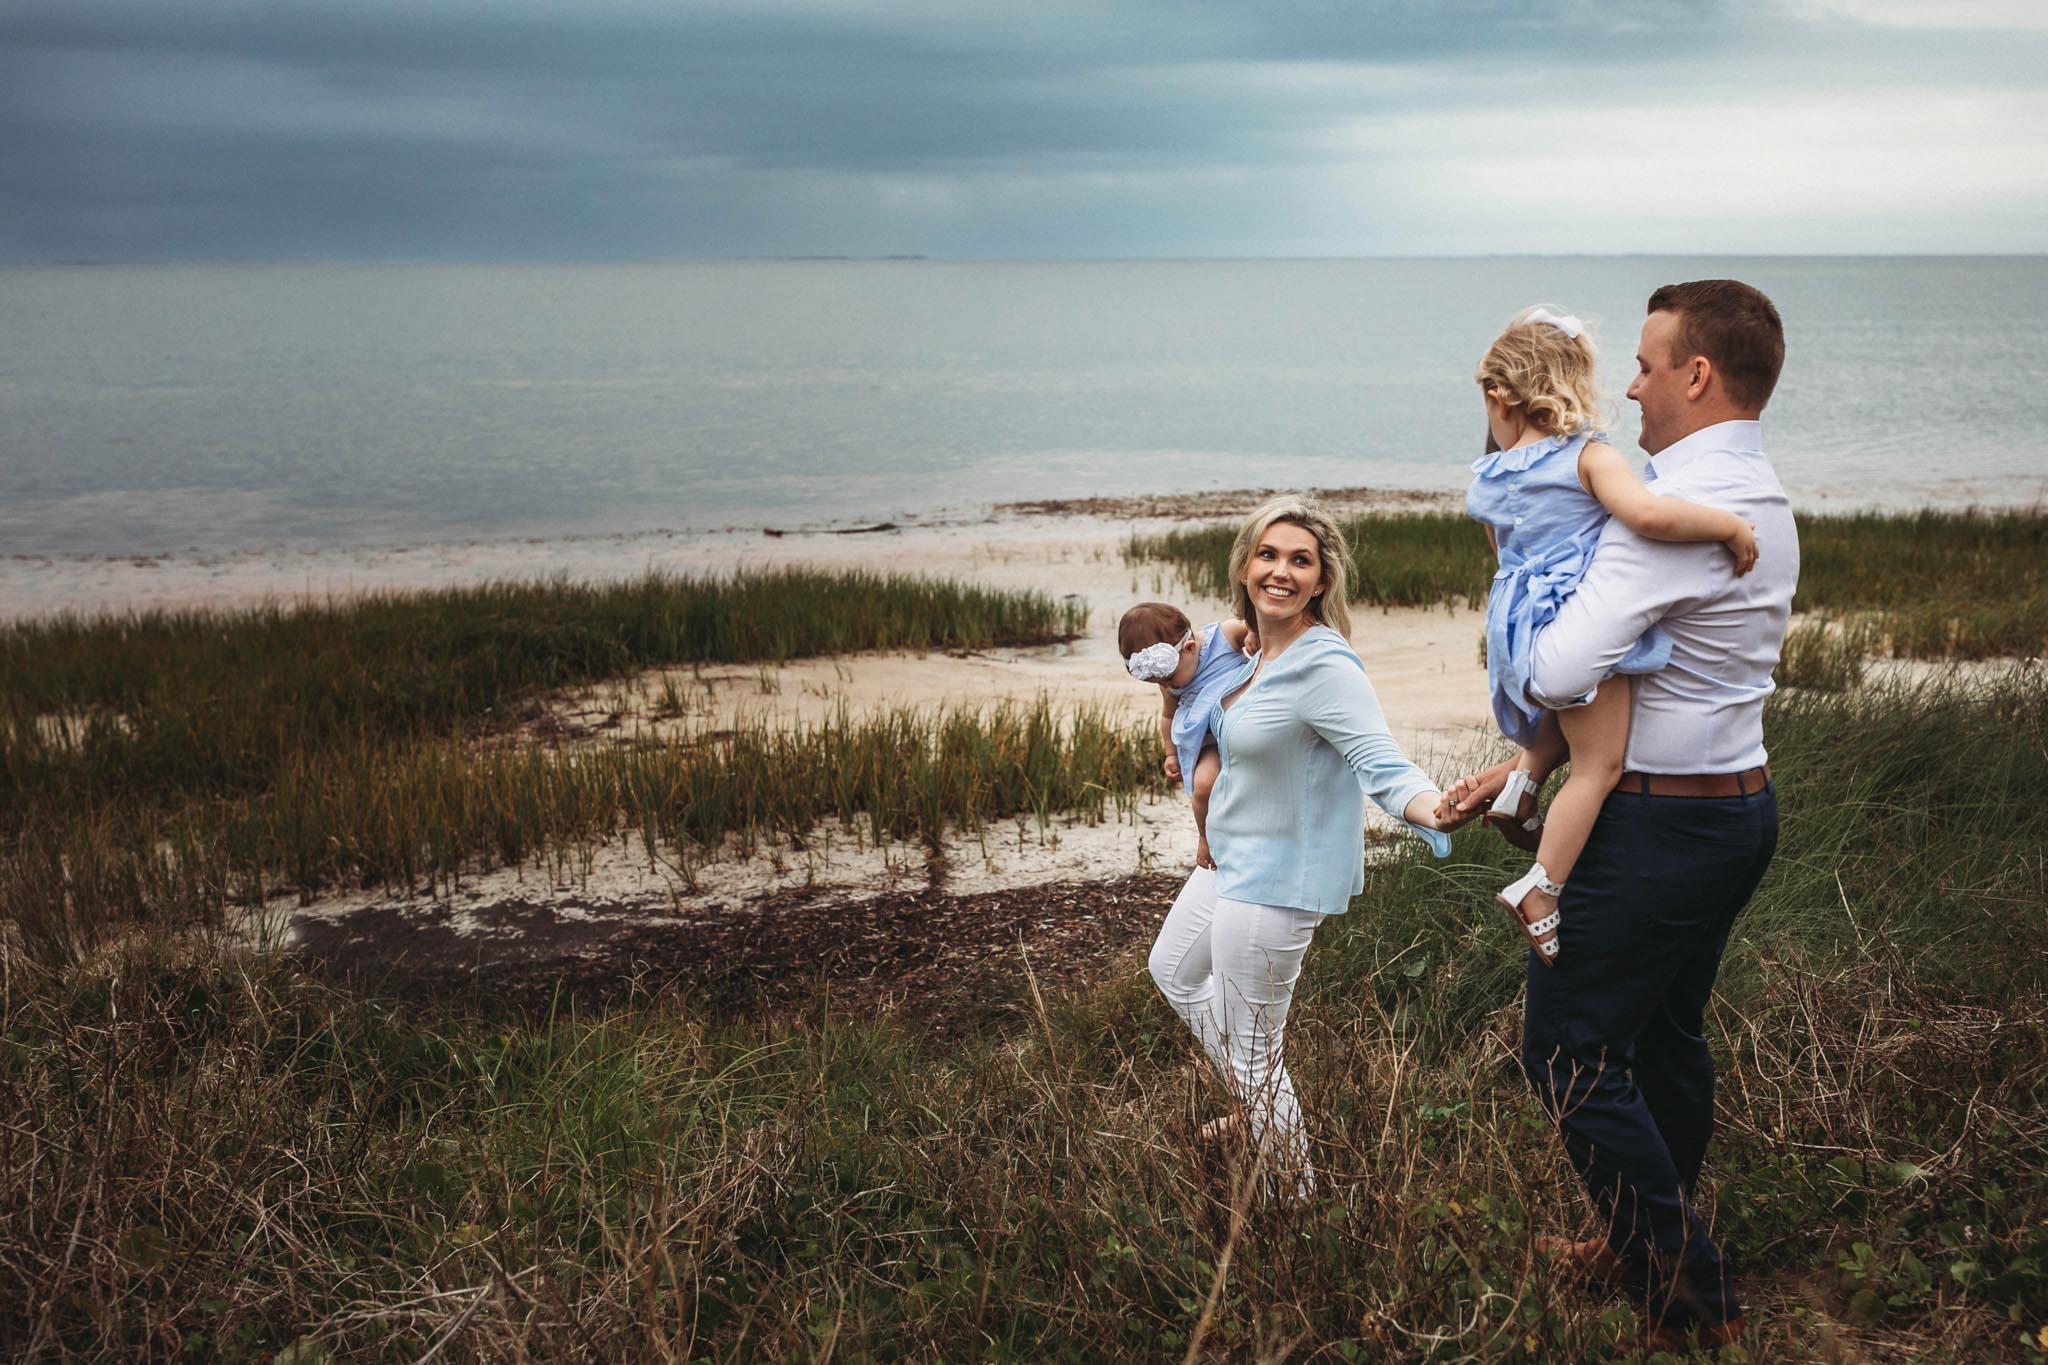 Tampa Family Photographer_Jennifer Kielich Photography_Jill S Family For Blog-24.jpg